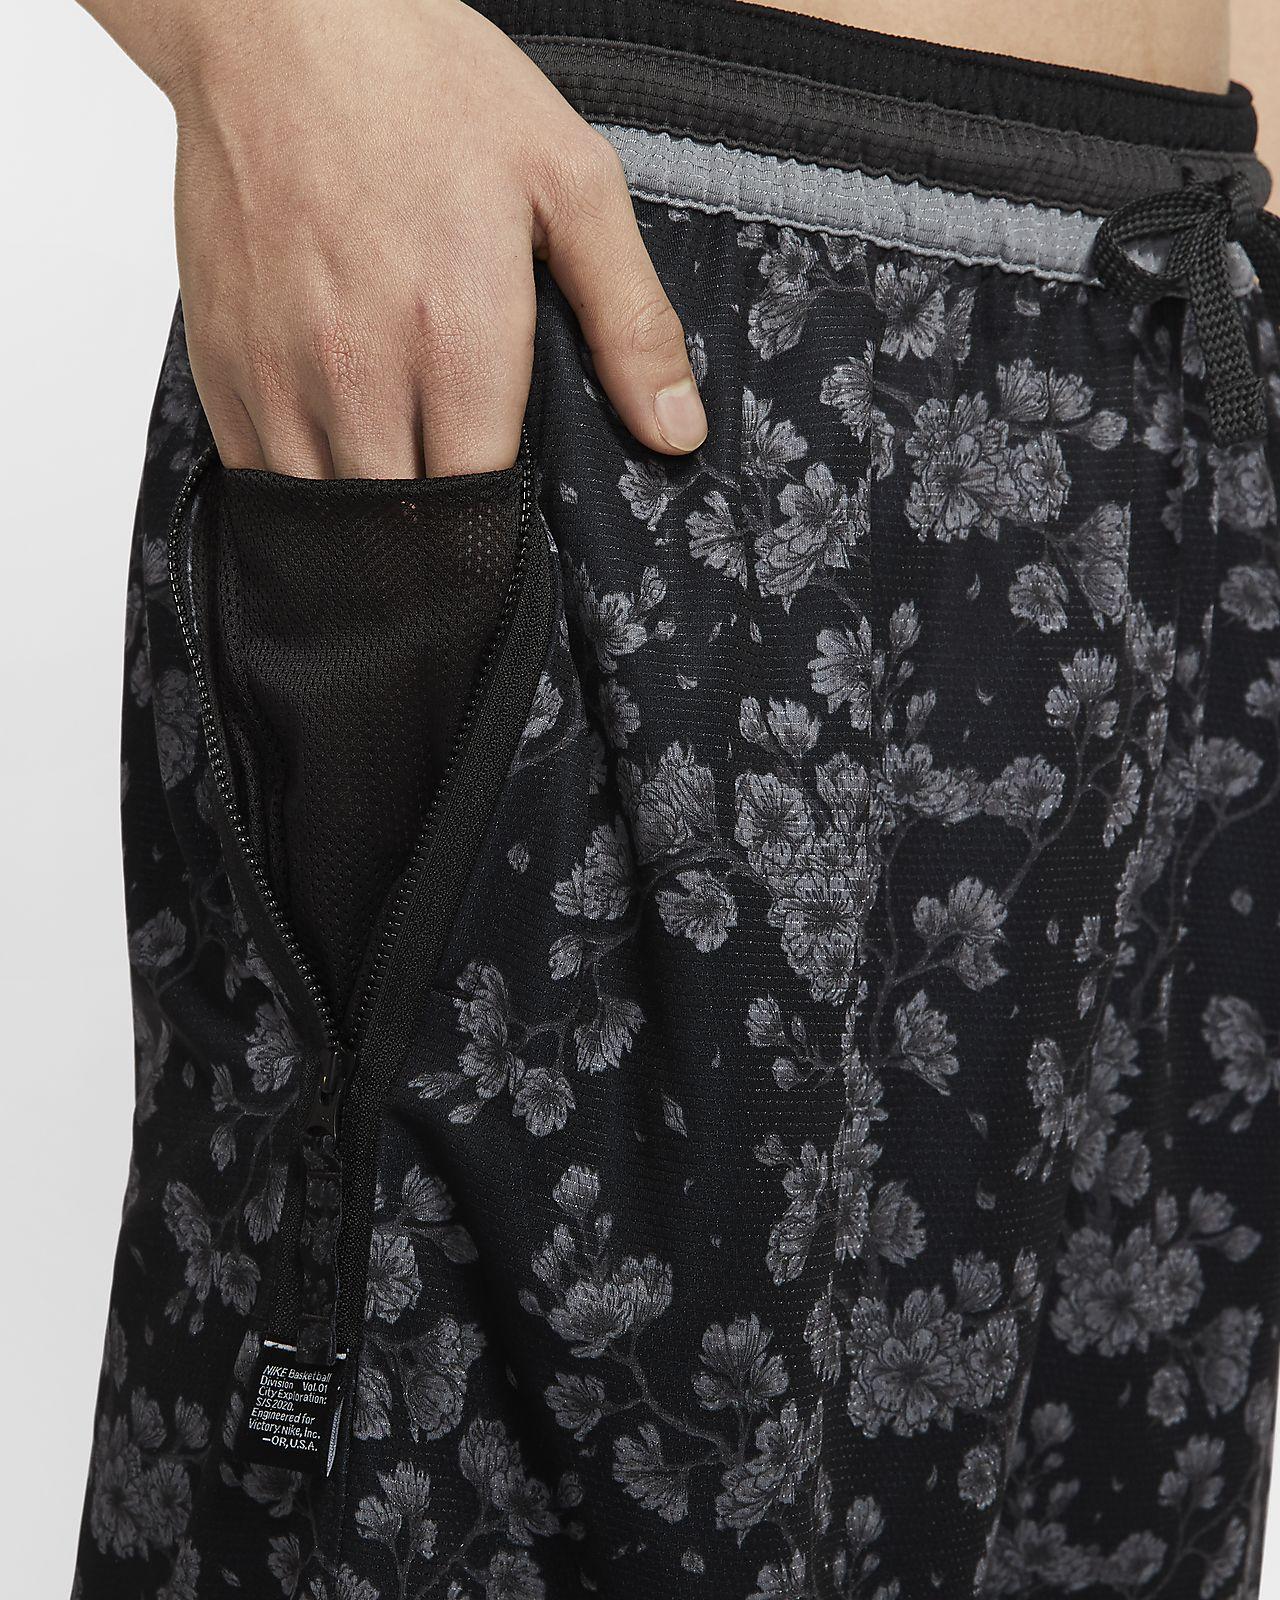 NWT NIKE WOMEN'S Drifit Pure Tennis Skirt (Black) Long